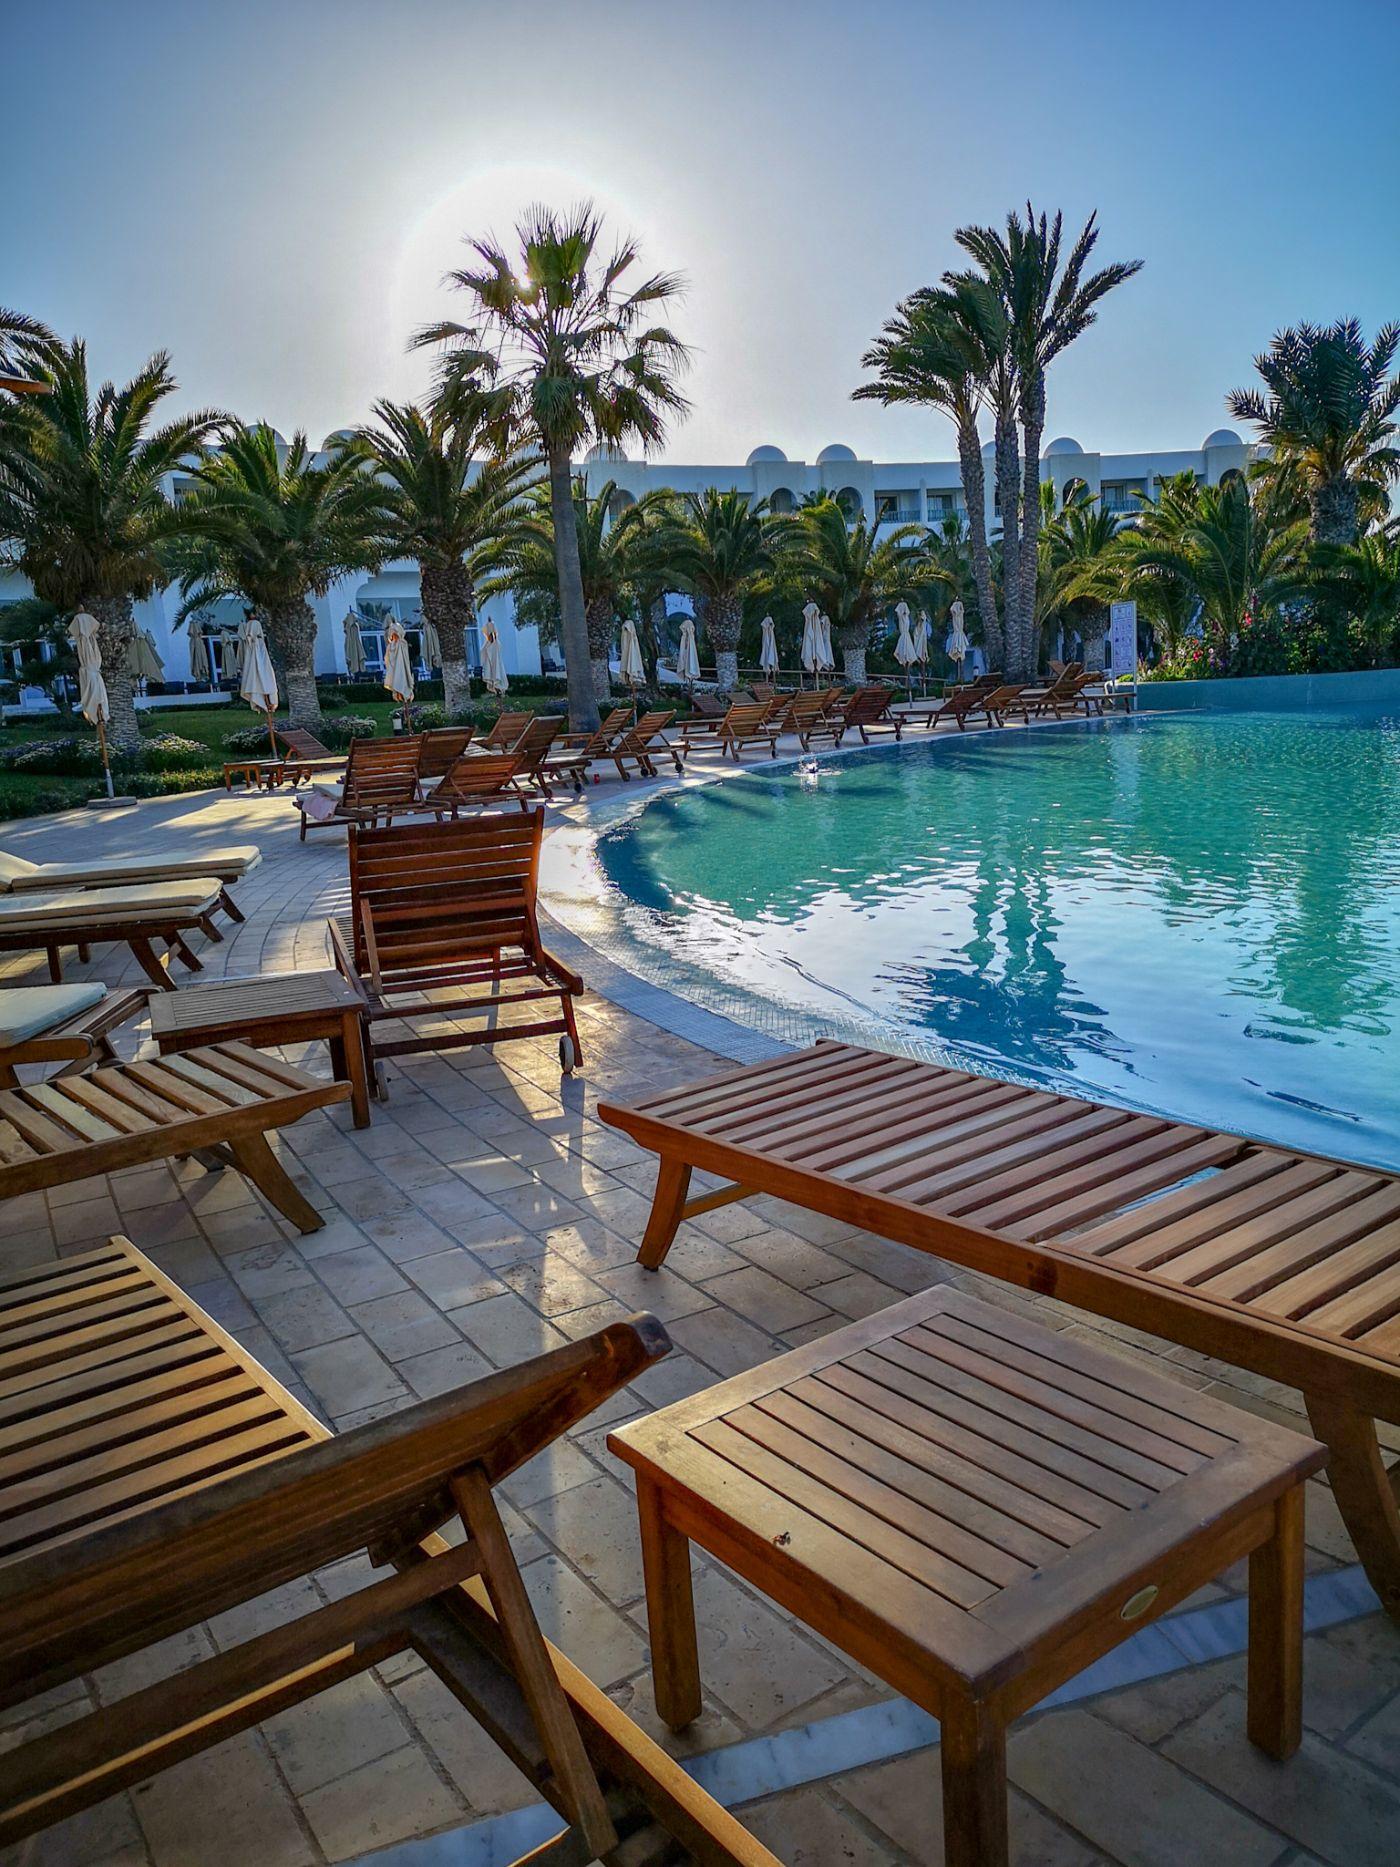 Hotel Royal Palace Djerba Tunezja basen leżaki all inclusive